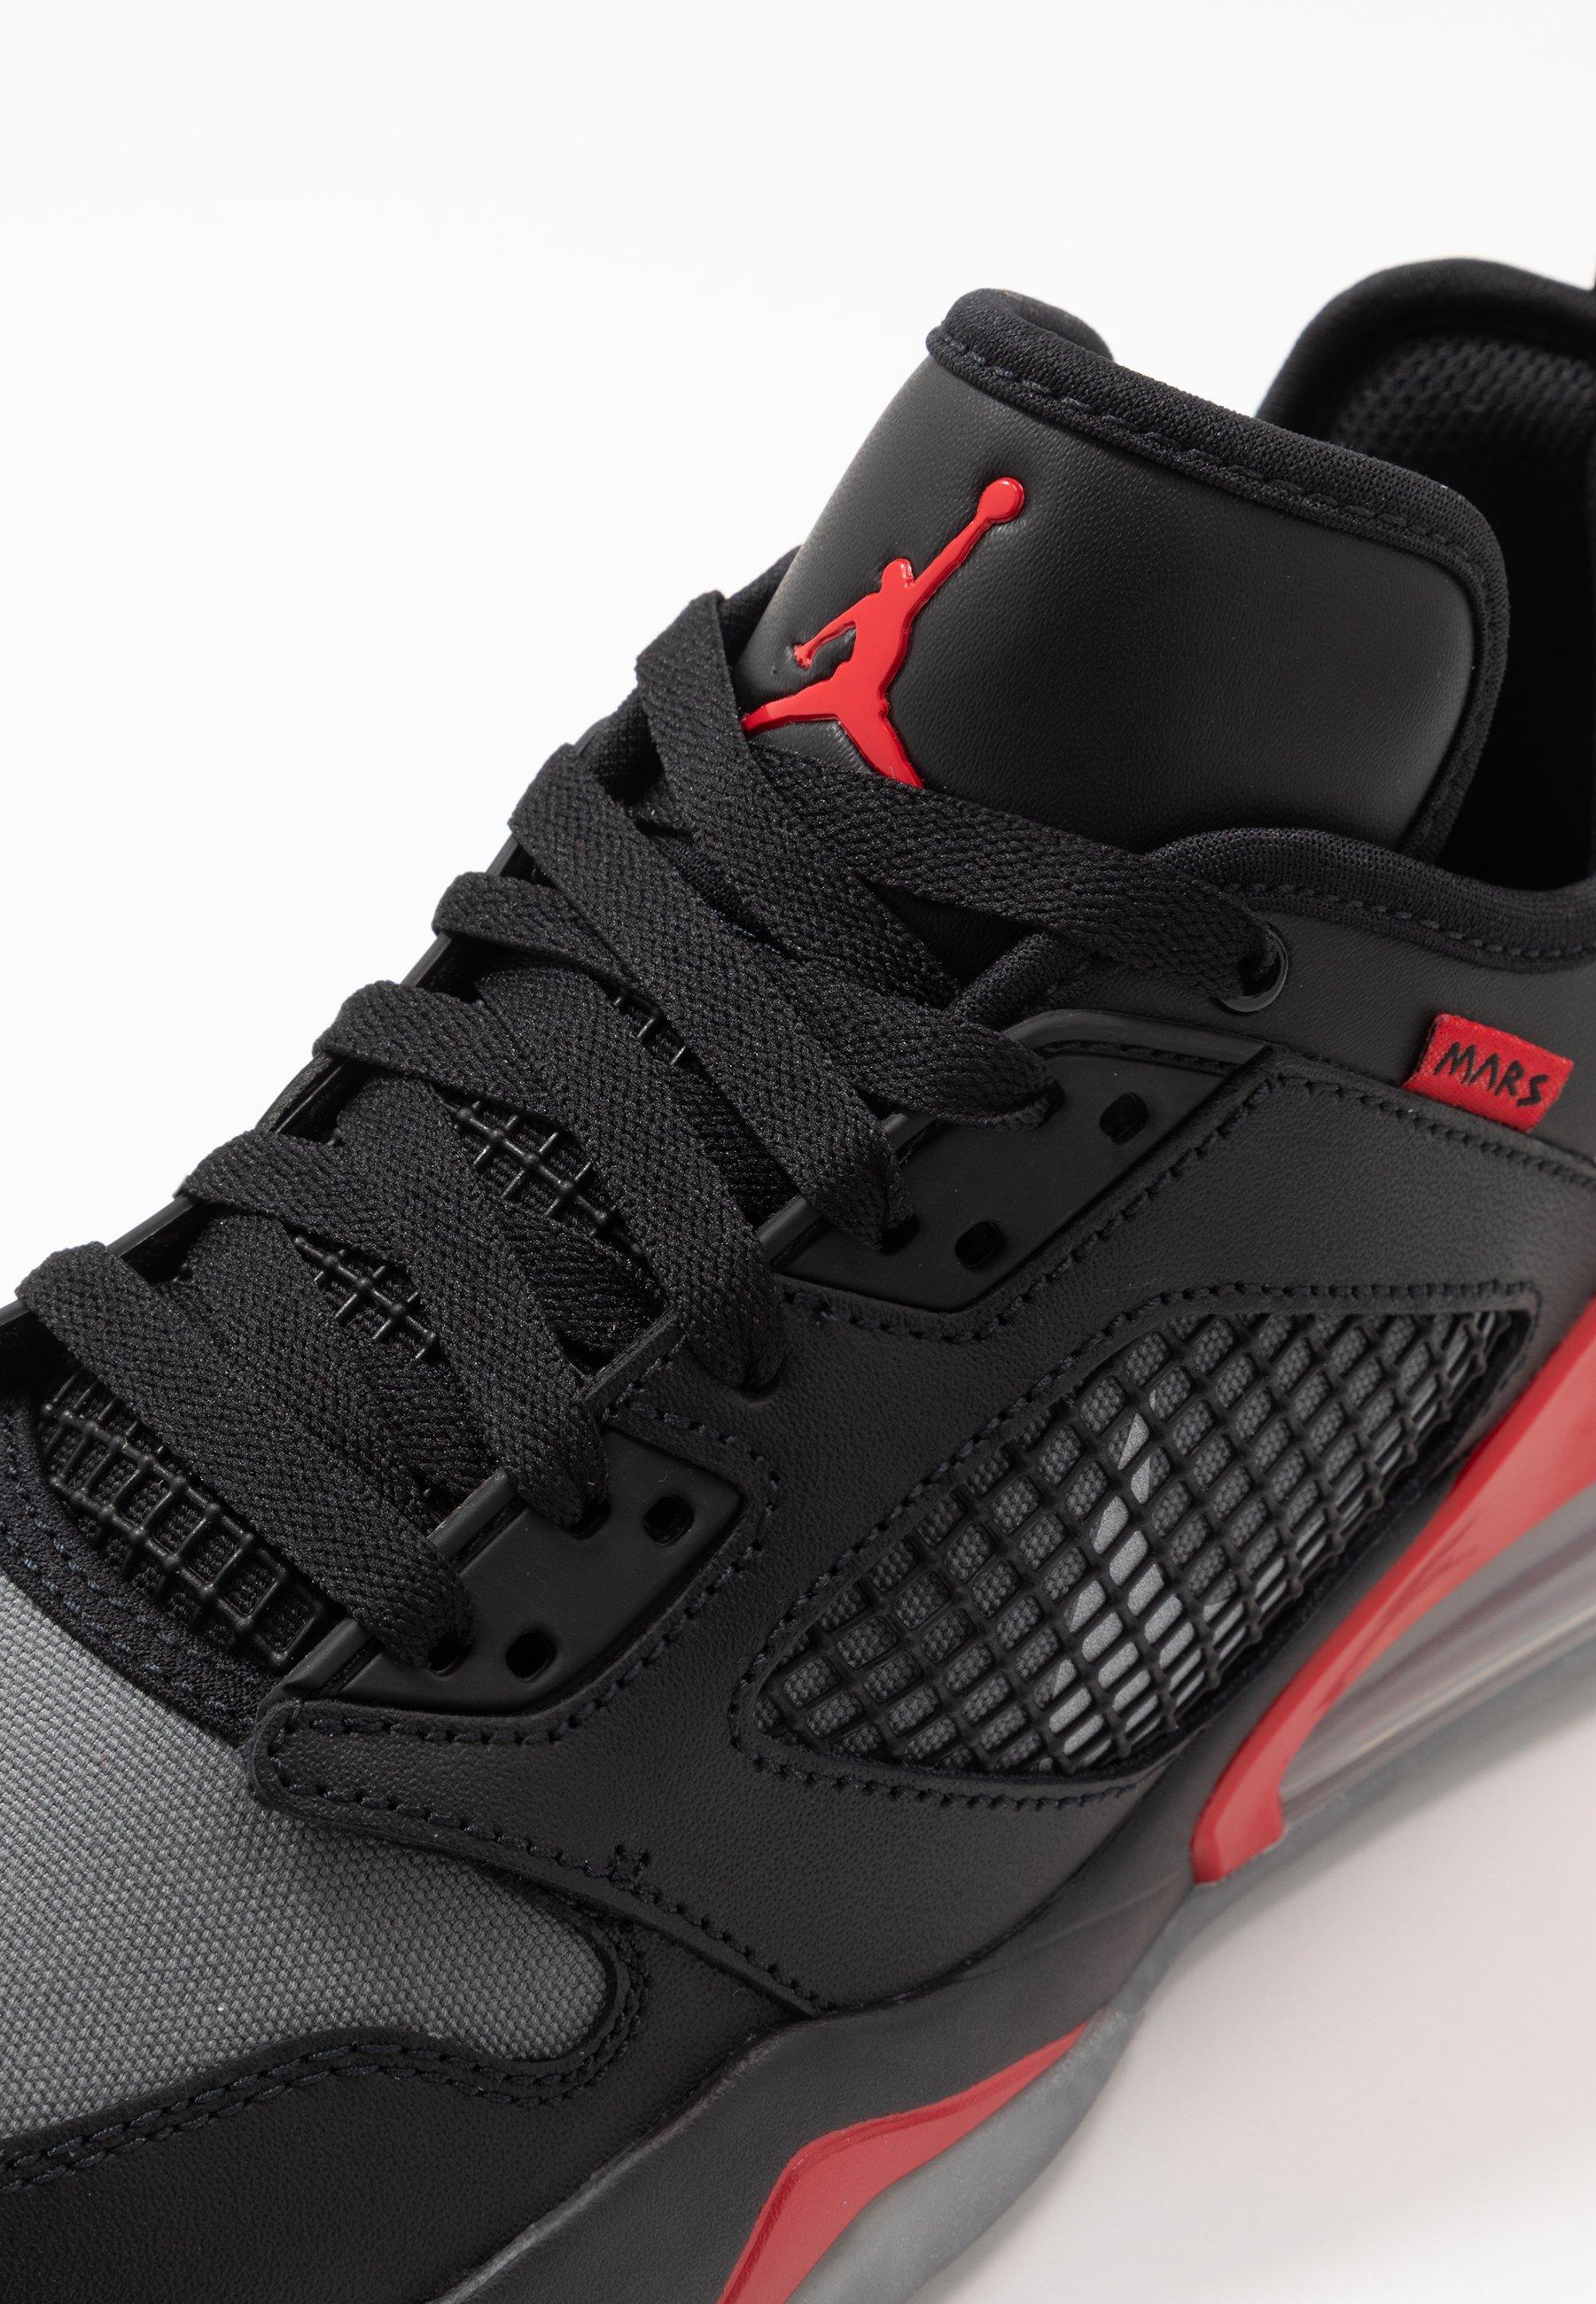 Jordan Mars 270 - Sneakers Laag Black/metallic Silver/university Red/wolf Grey/dark Grey/white Goedkope Schoenen